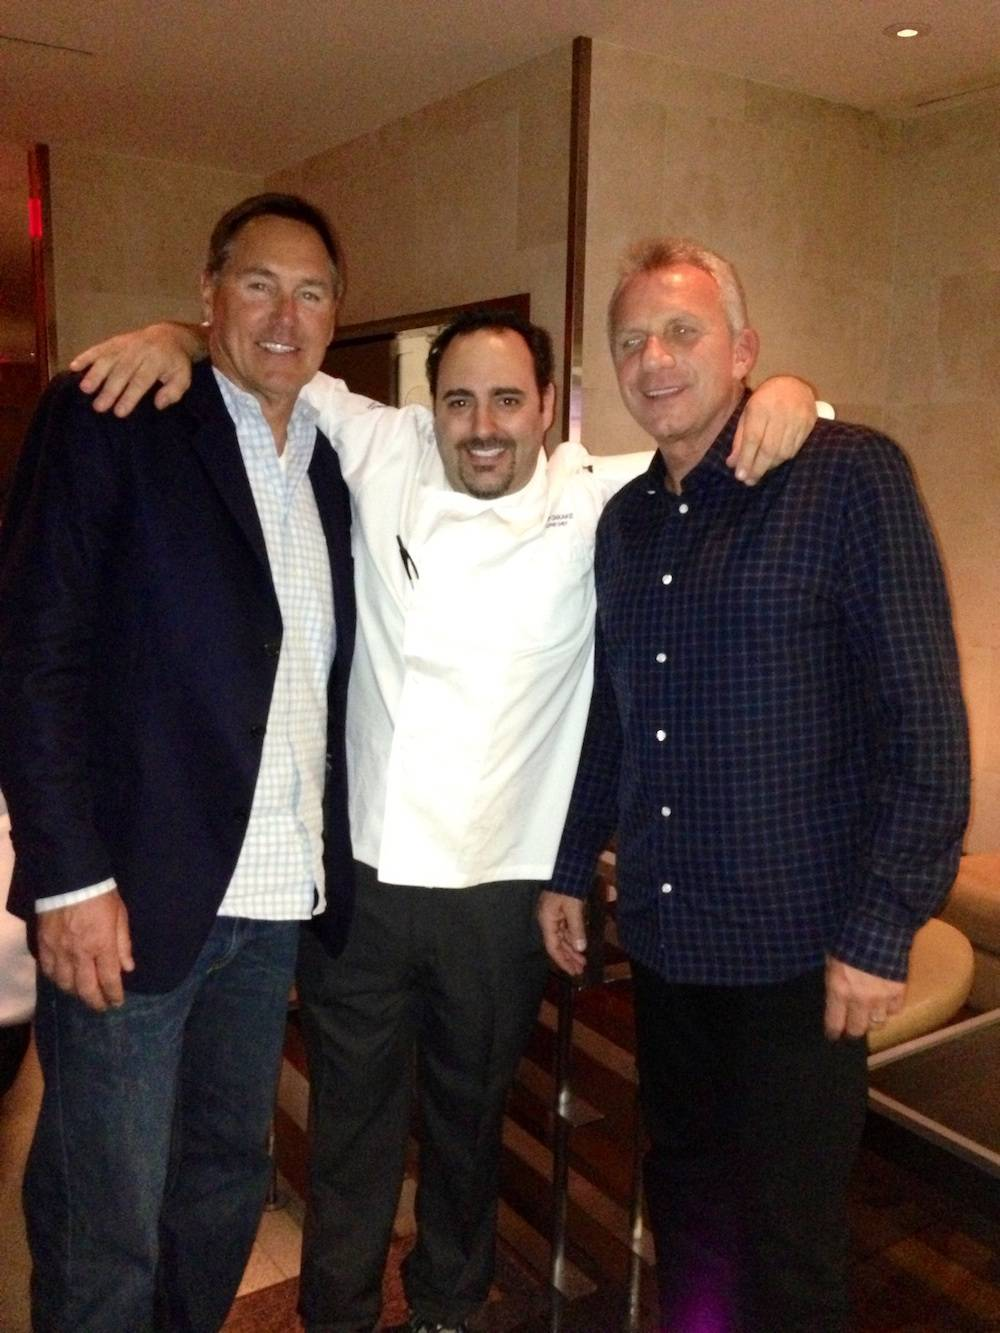 Dwight Clark, chef Barry Dakake and Joe Montana at N9NE Steakhouse